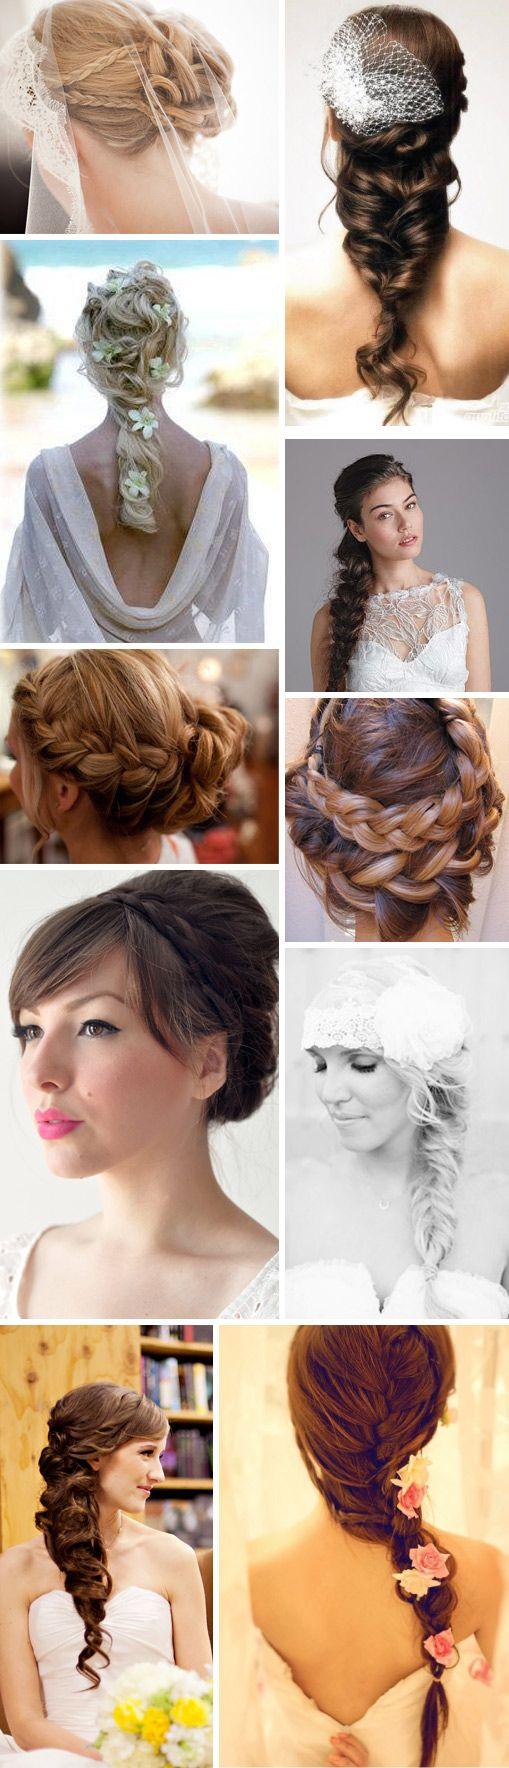 Wedding Hair Inspiration: {Braids}